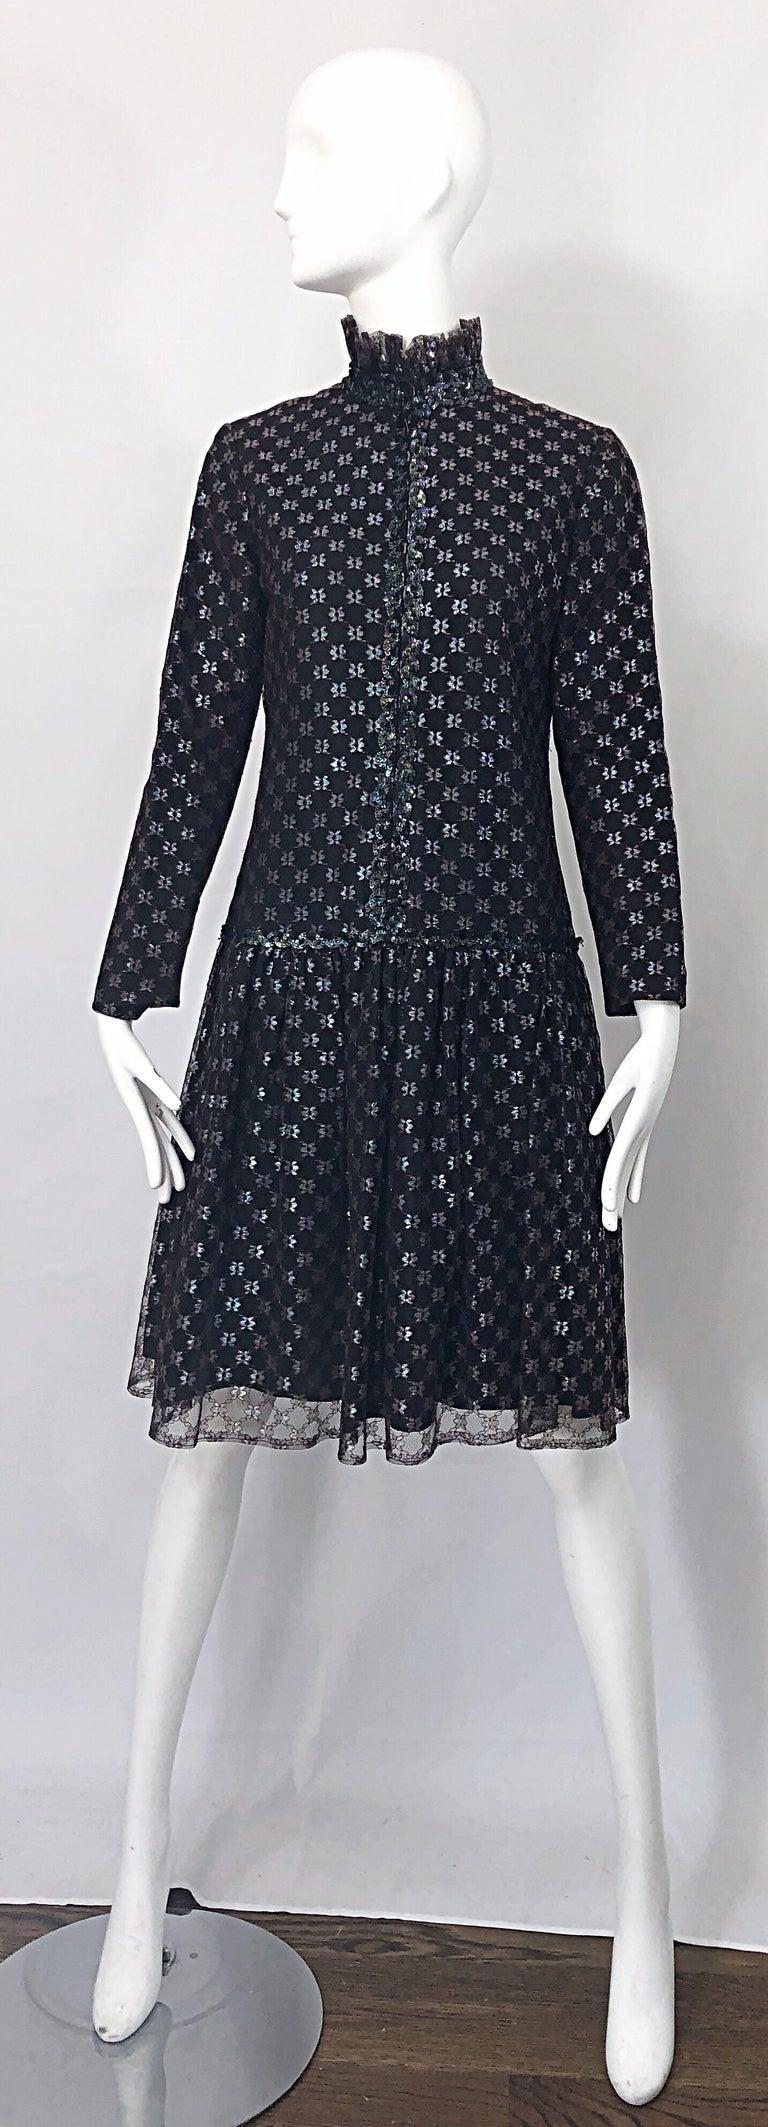 Oscar de la Renta 1970s Black + Burgundy Red Iridescent Sequin Drop Waist Dress For Sale 11